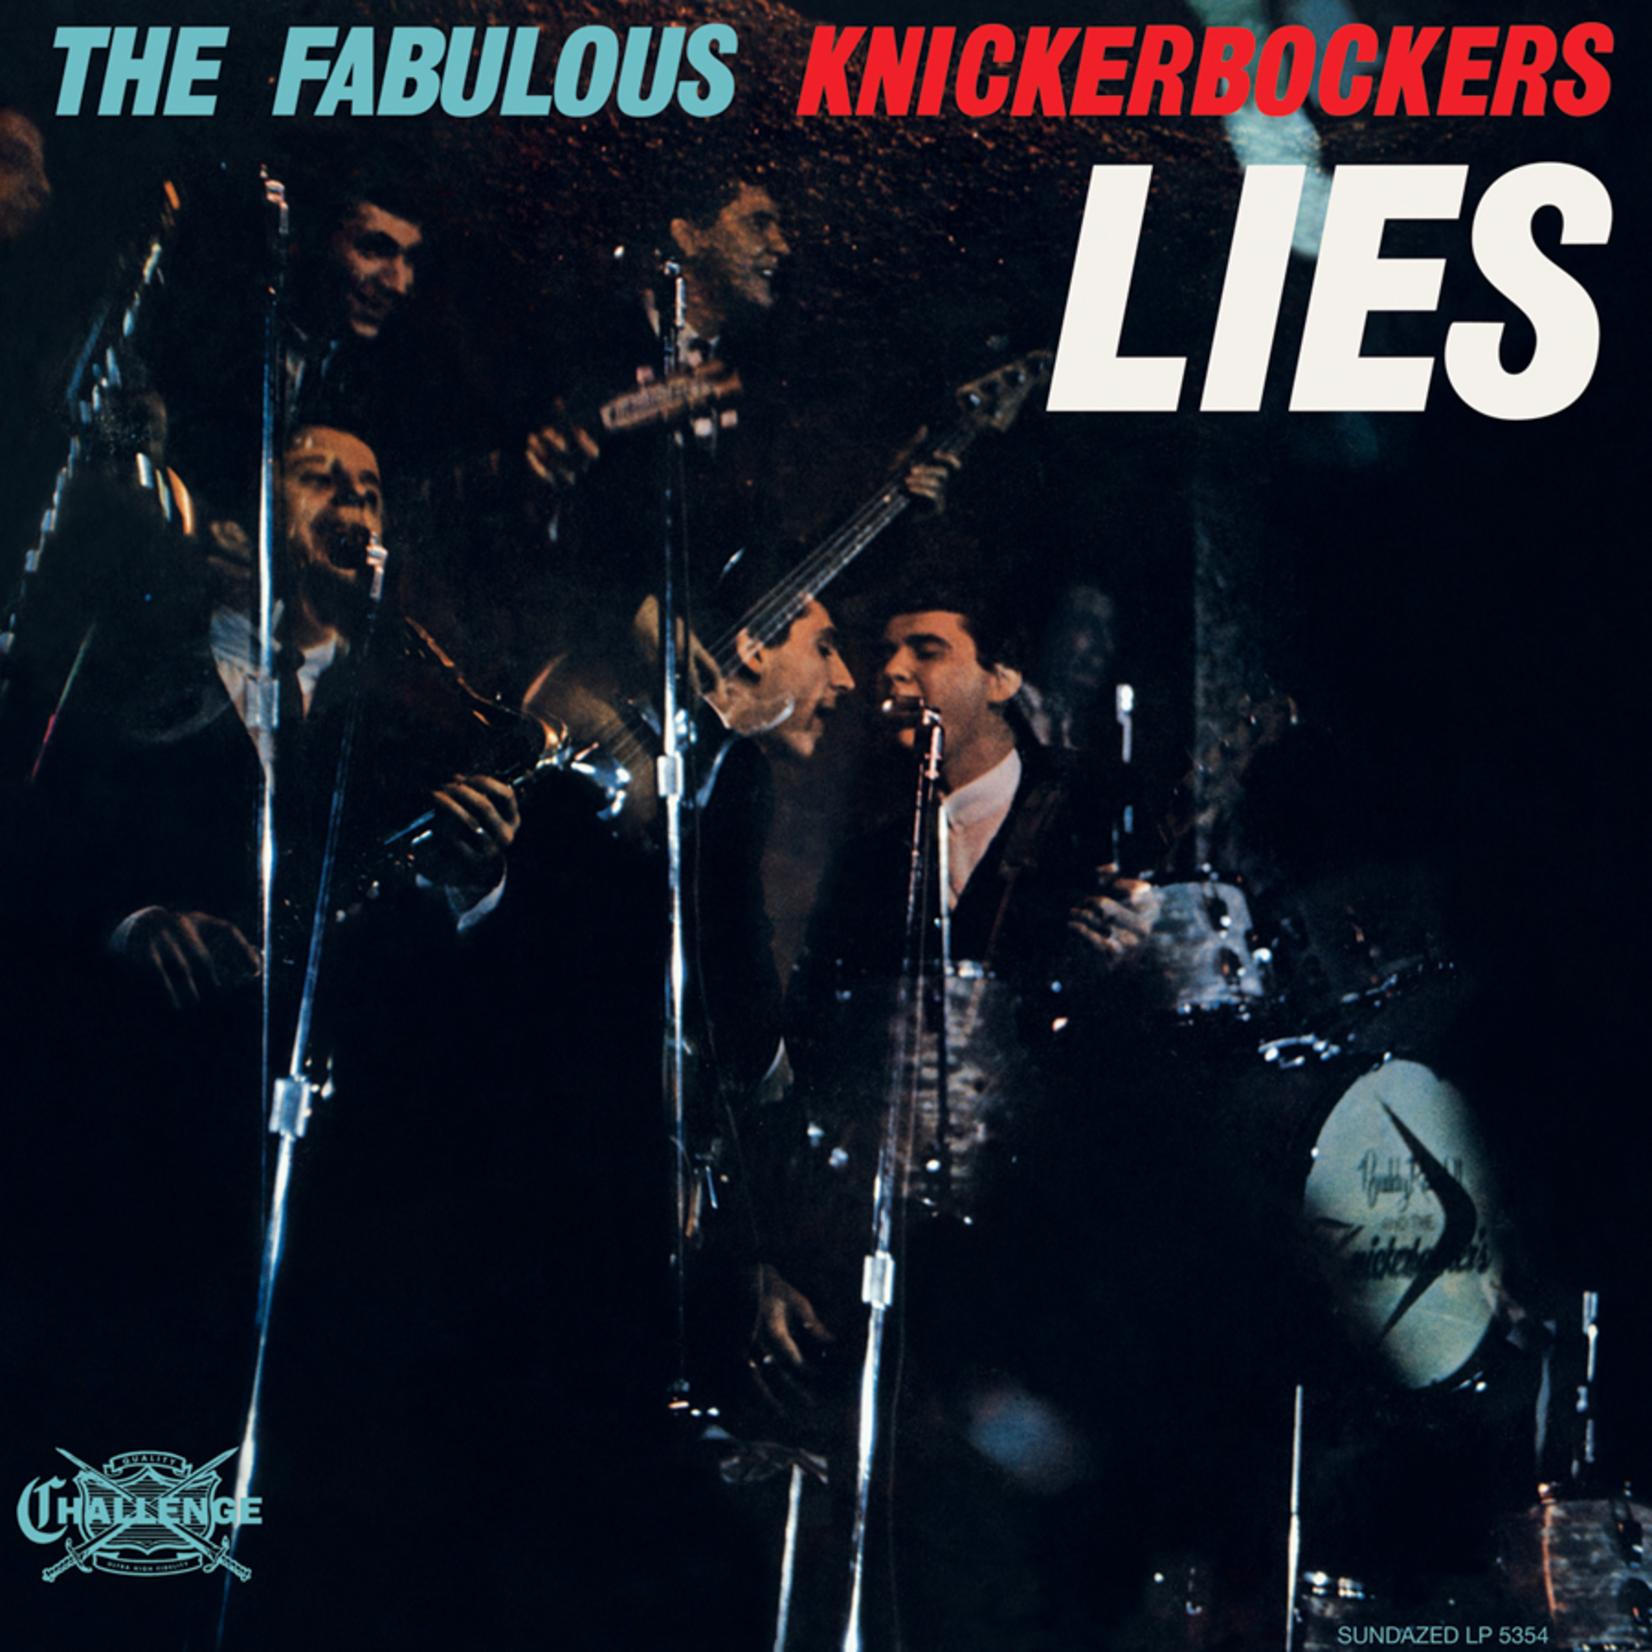 Vinyl The Knickerbockers - Lies